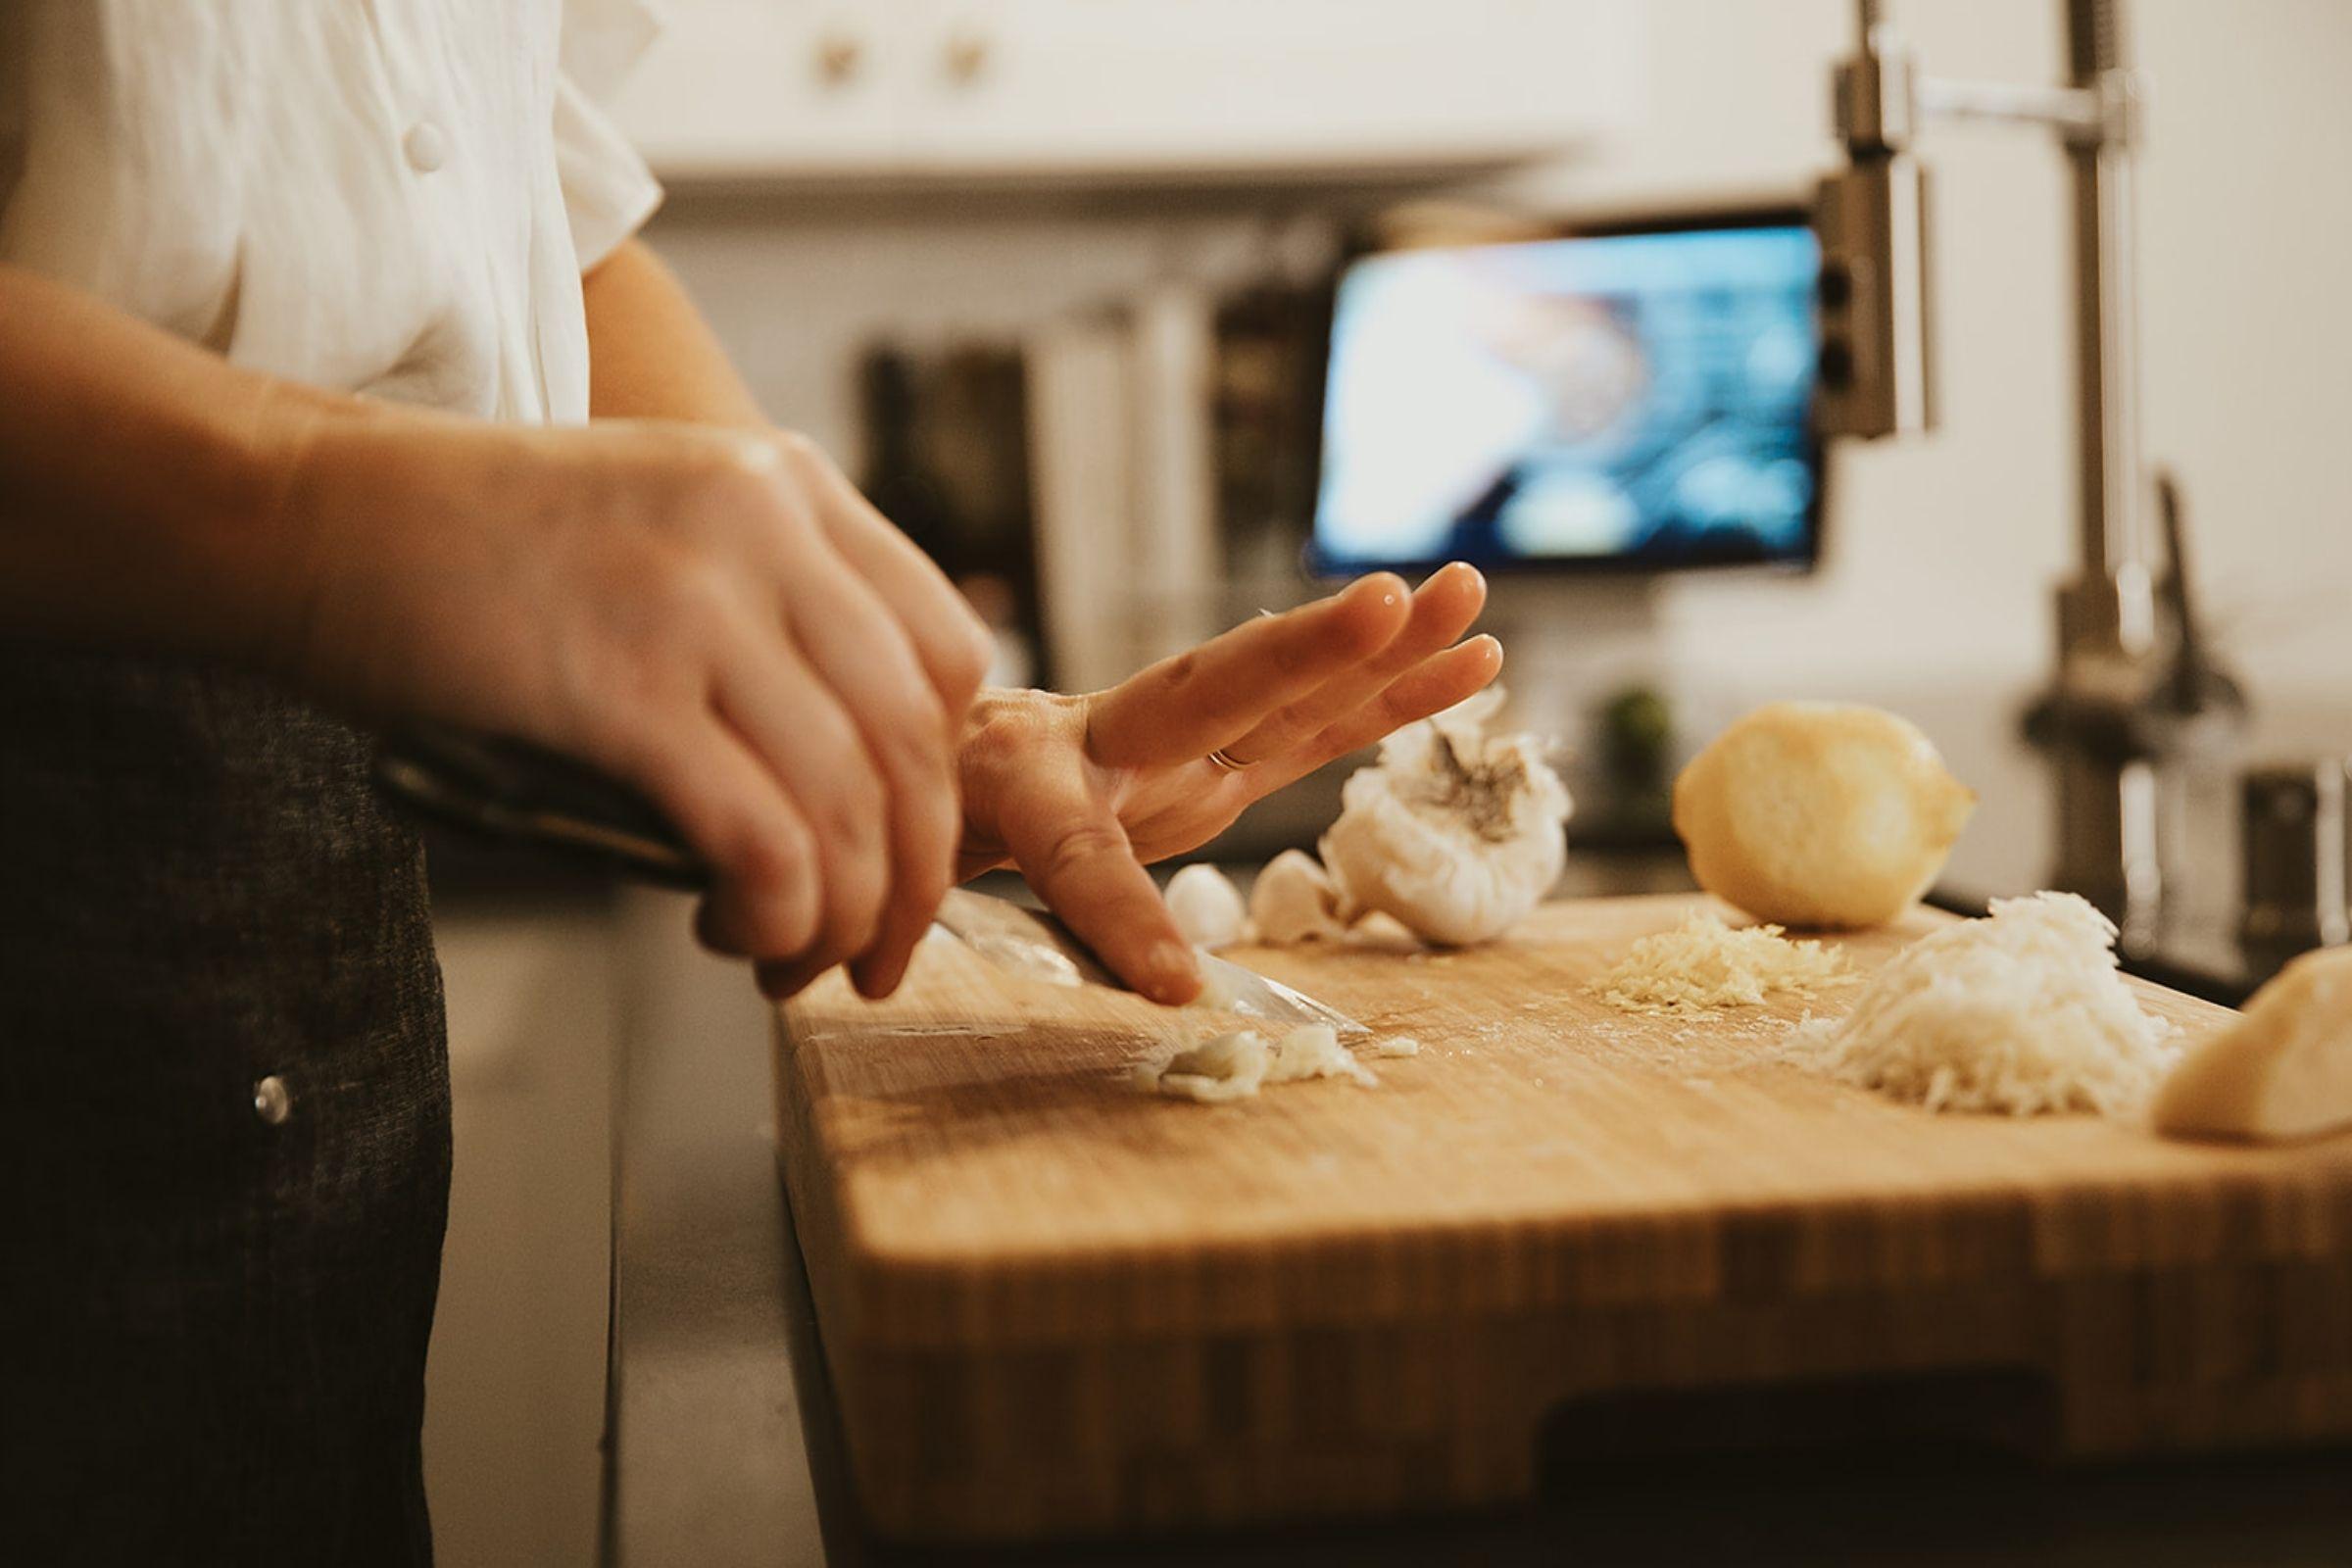 woman during virtual events chopping garlic